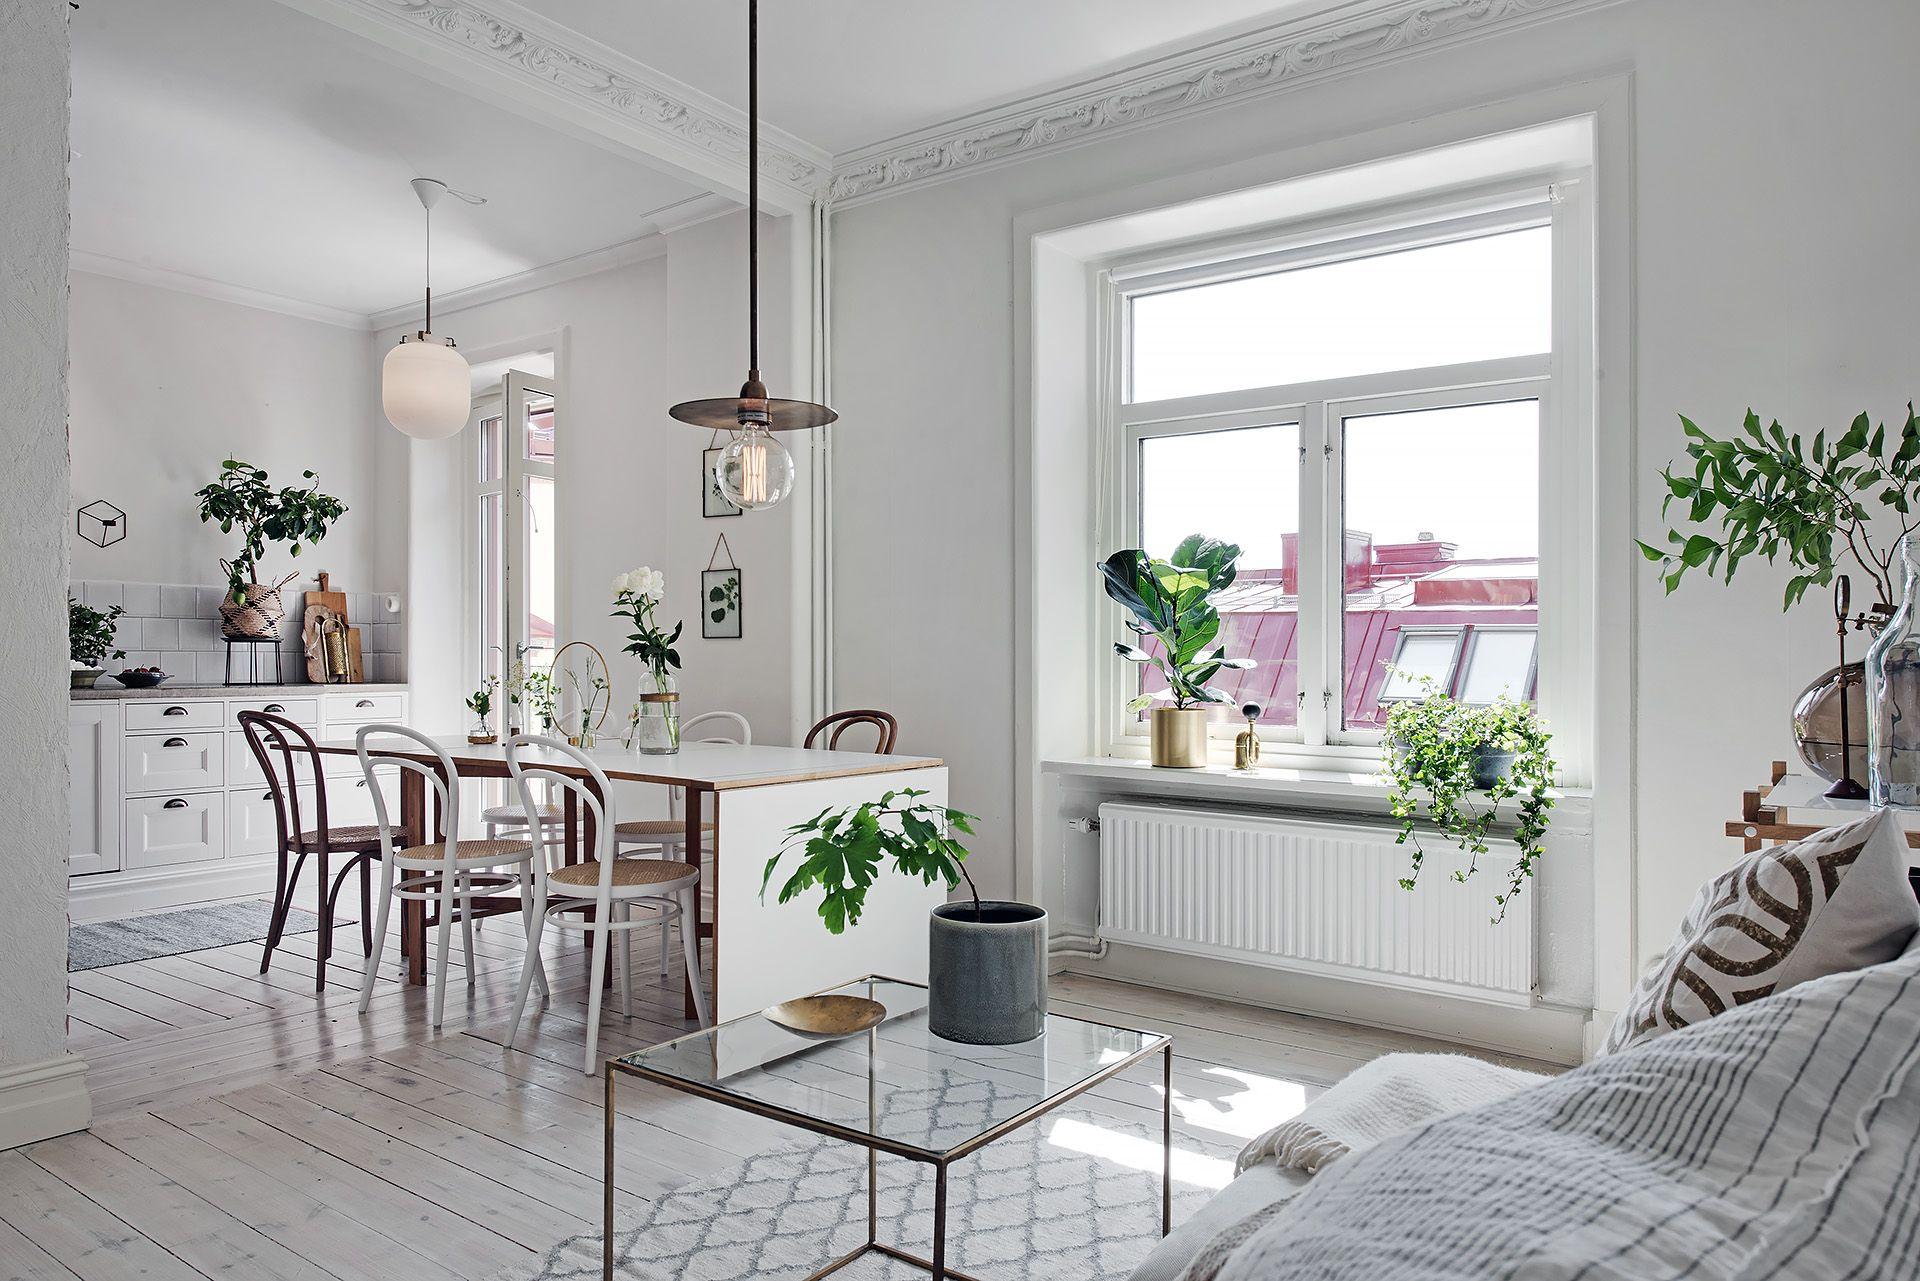 Departamento escandinavo con cocina abierta de dise o depto9 for Cocinas de departamentos